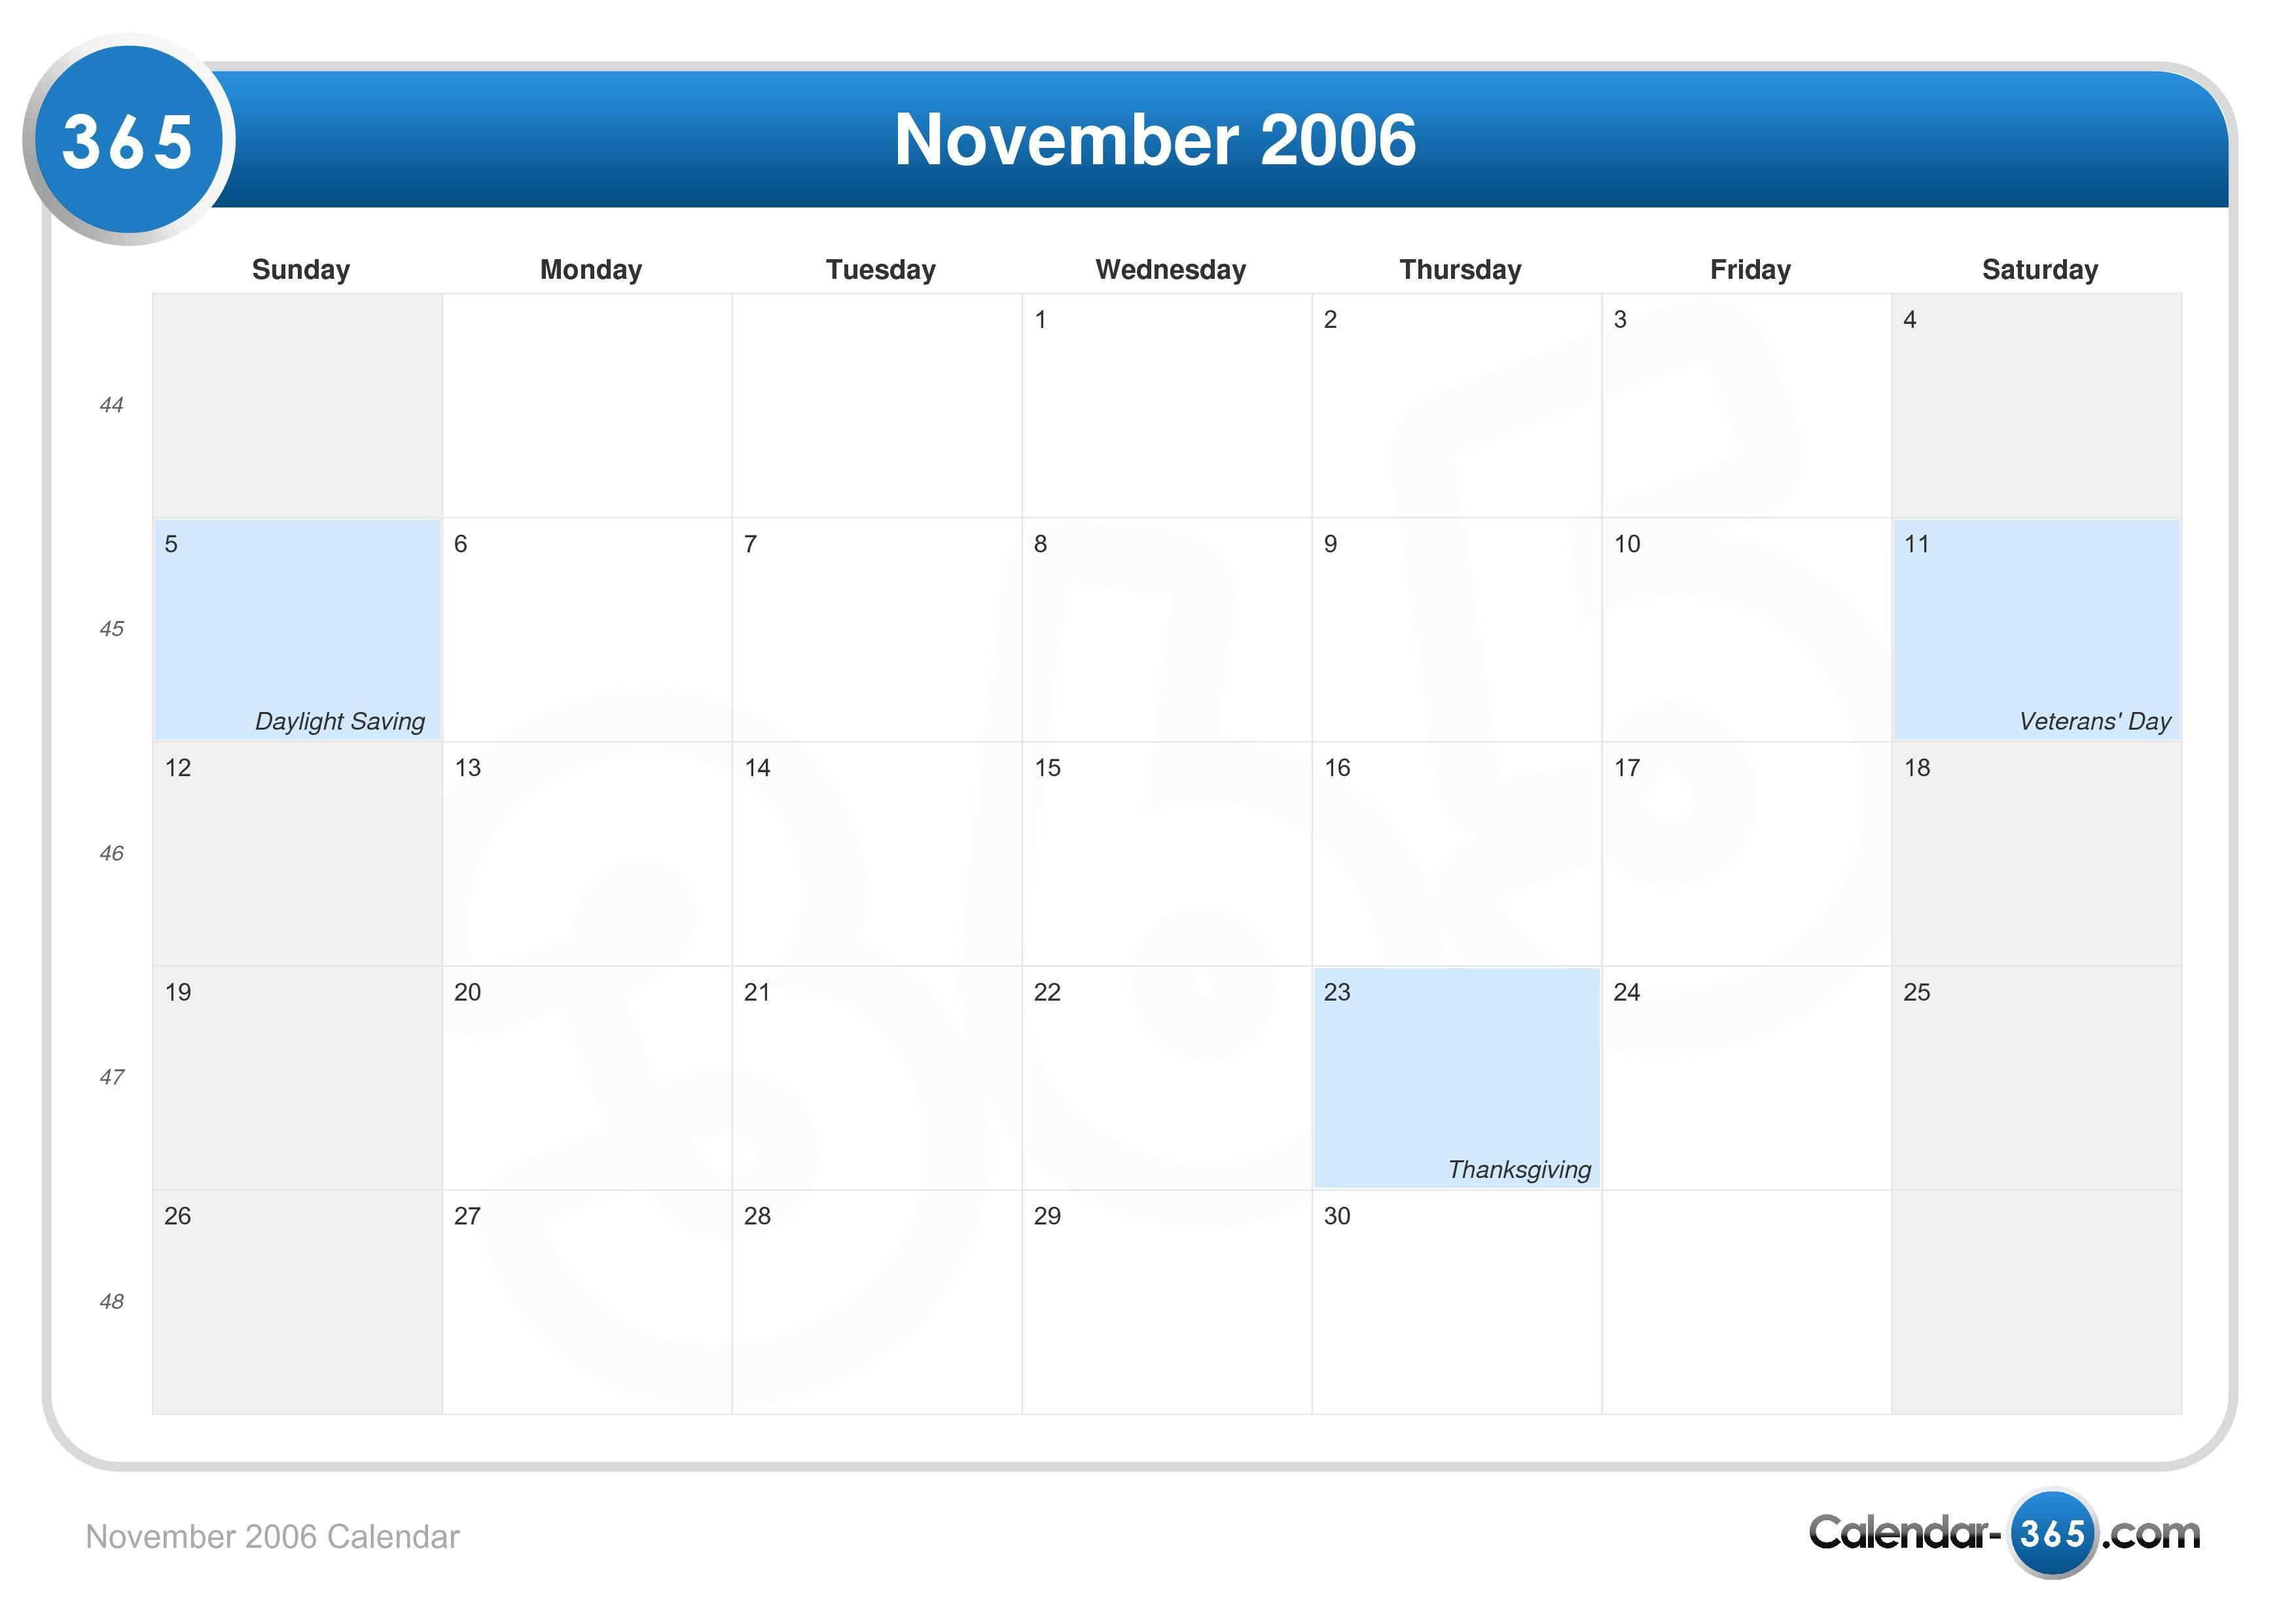 November 2006 Calendar